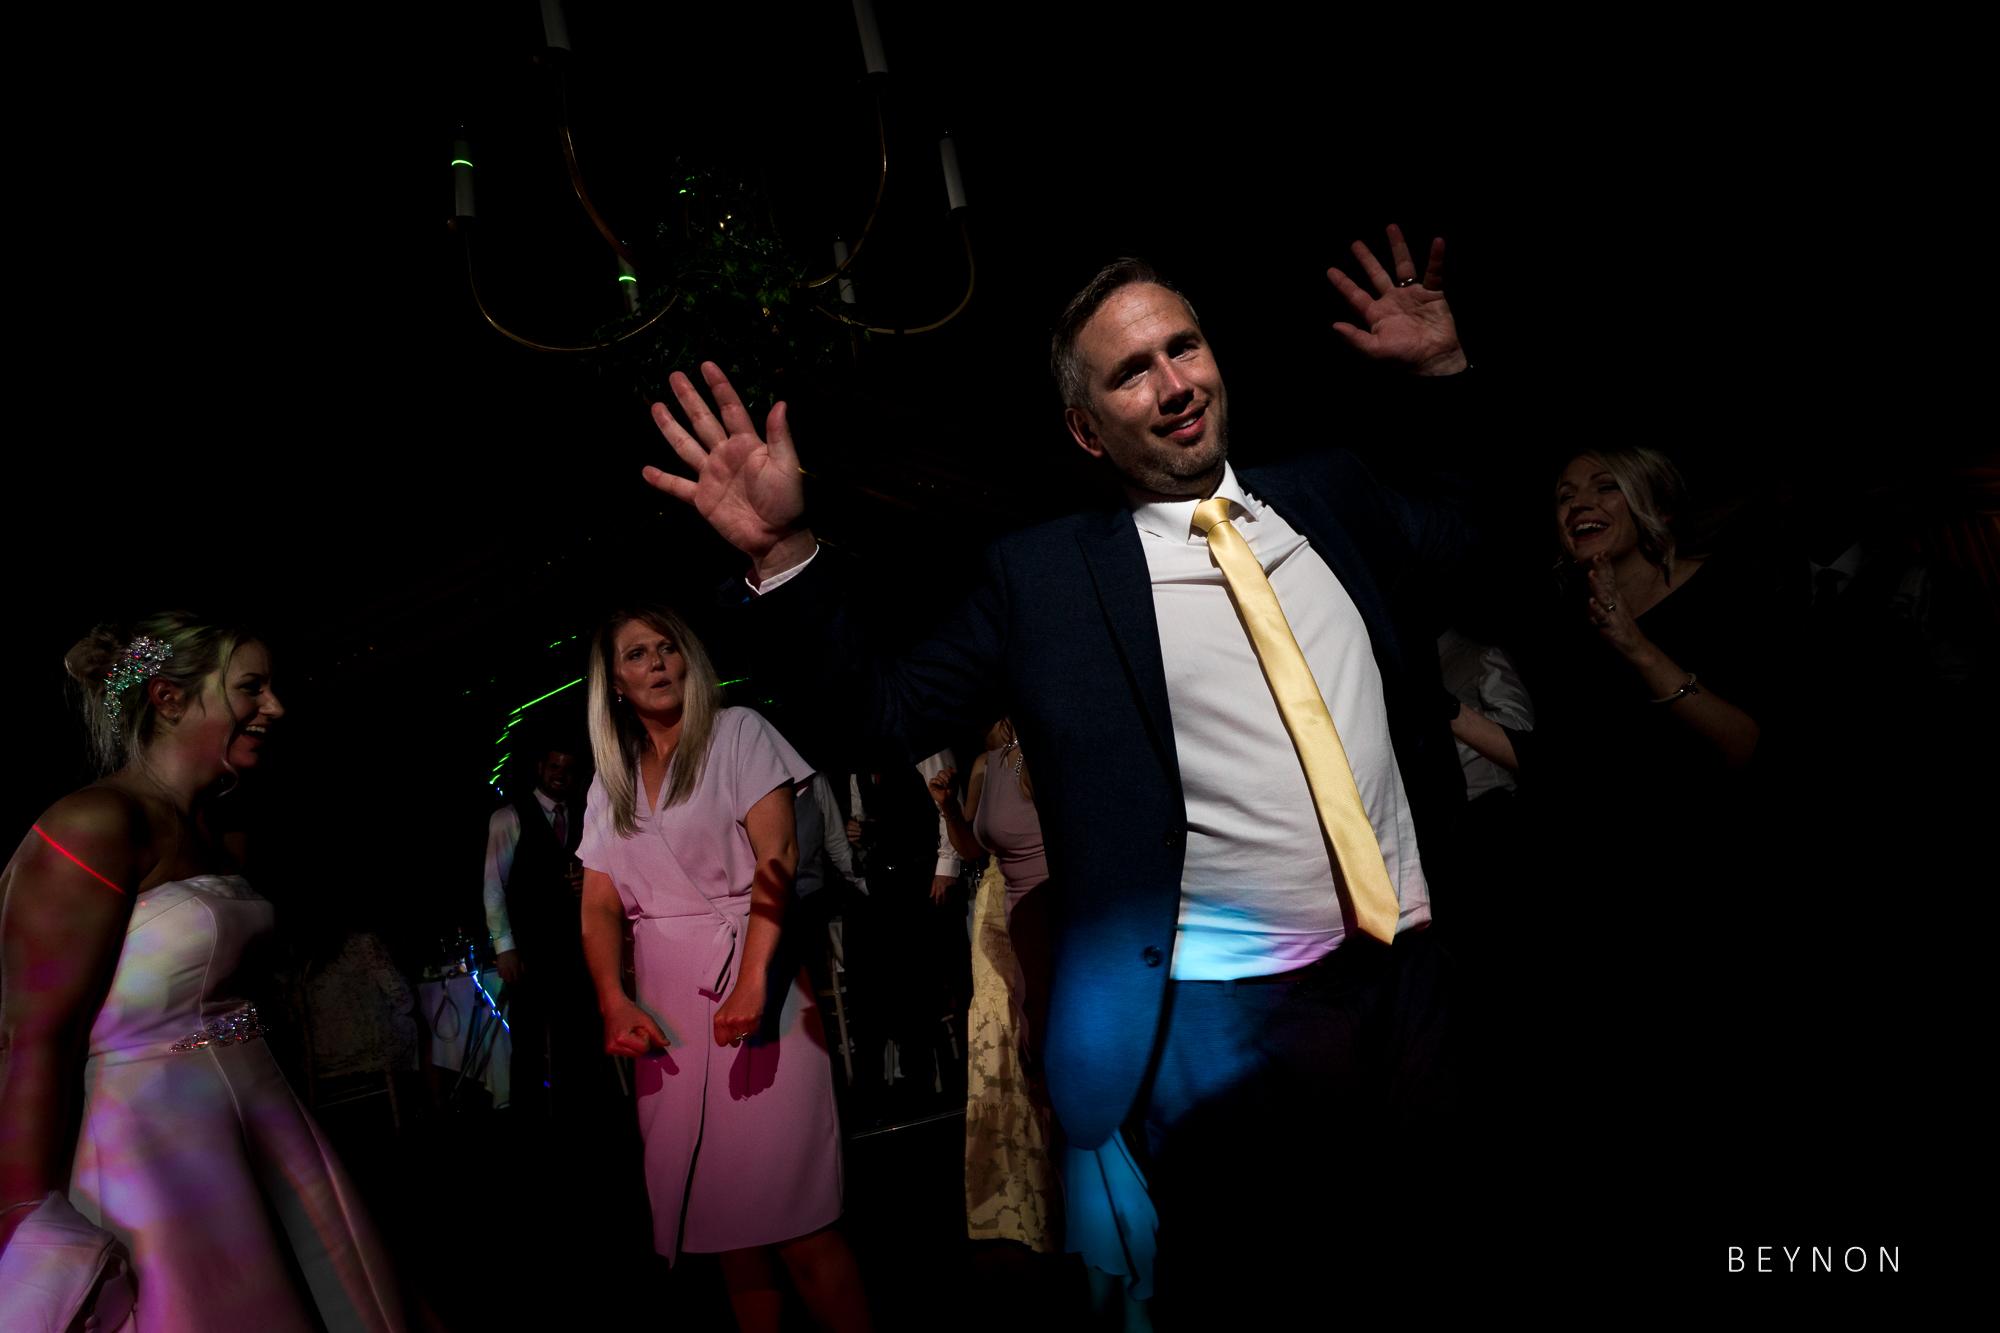 Enthusiastic dancing at wedding reception